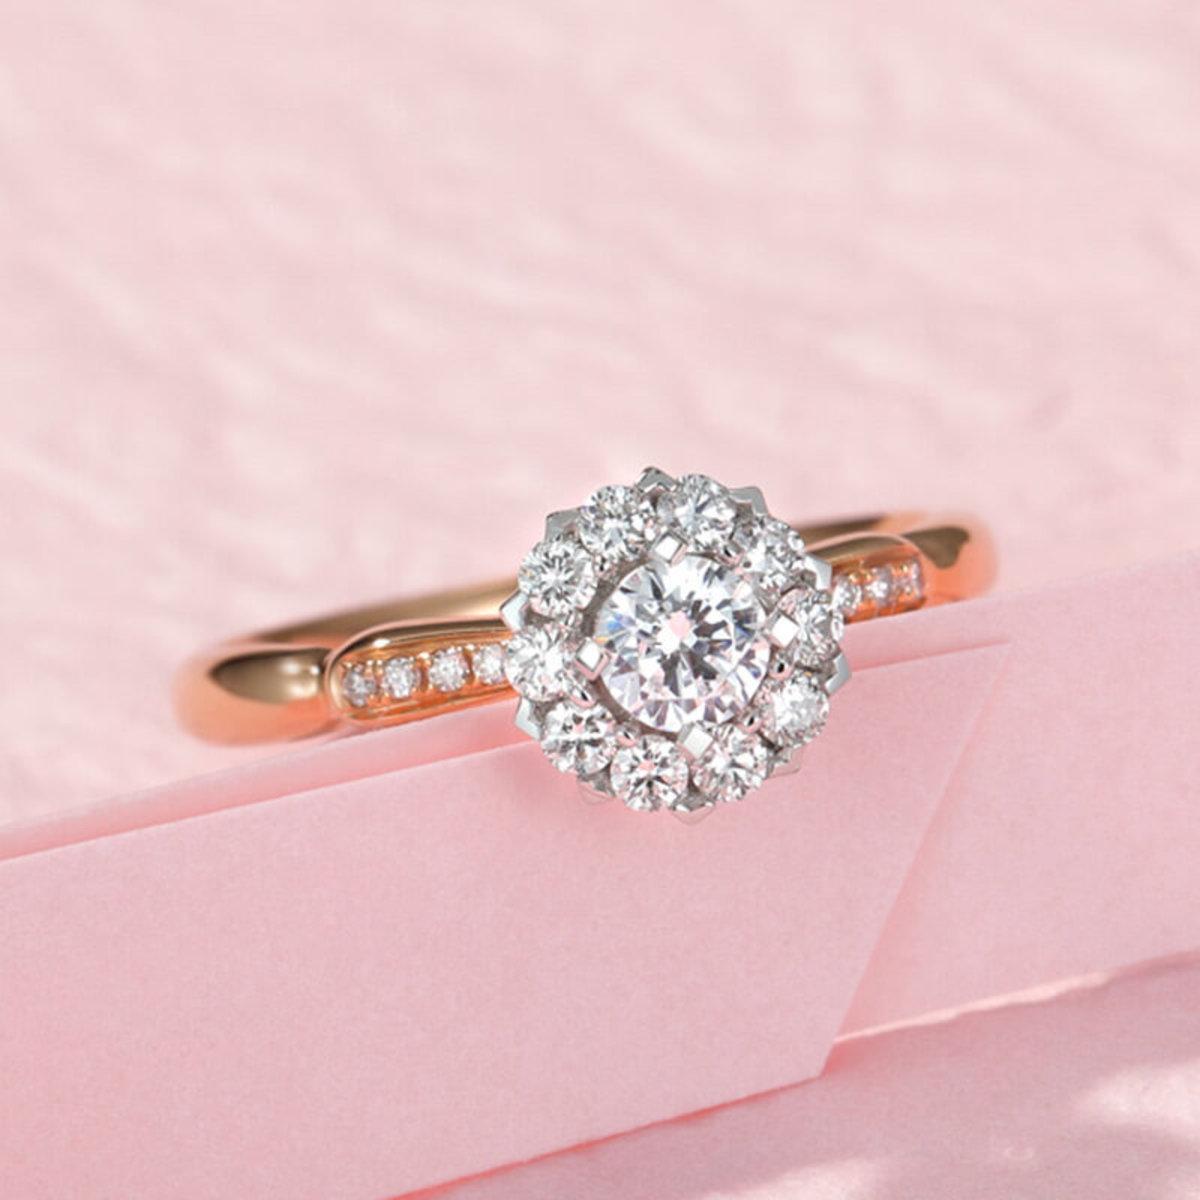 【BDD-Co.】18k玫瑰金 花團錦簇設計鑽石女戒